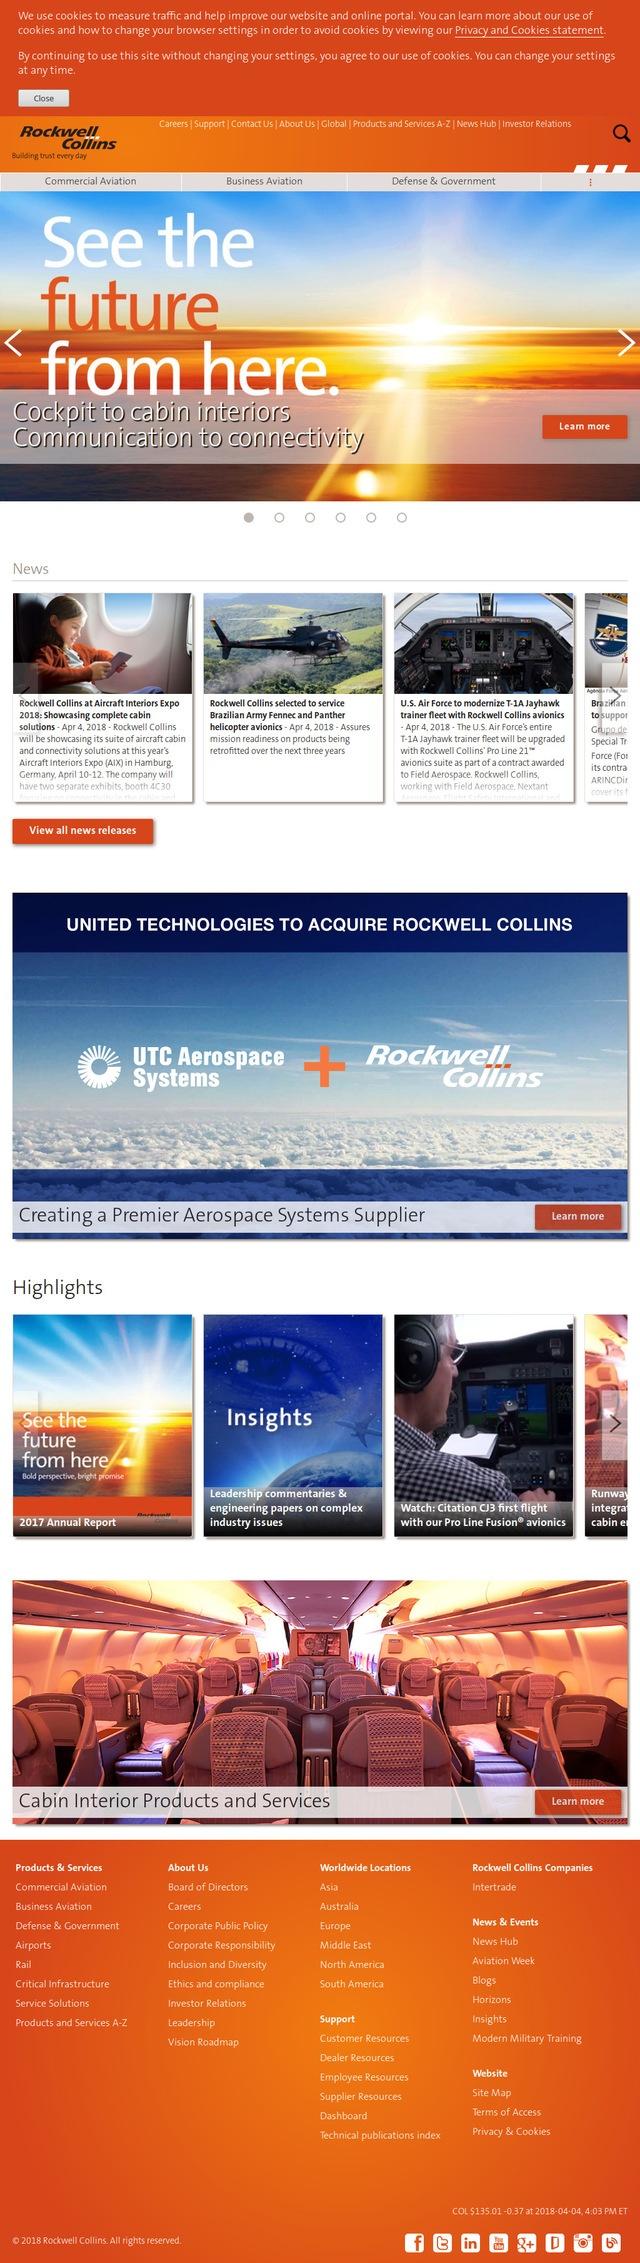 rockwellcollins.com